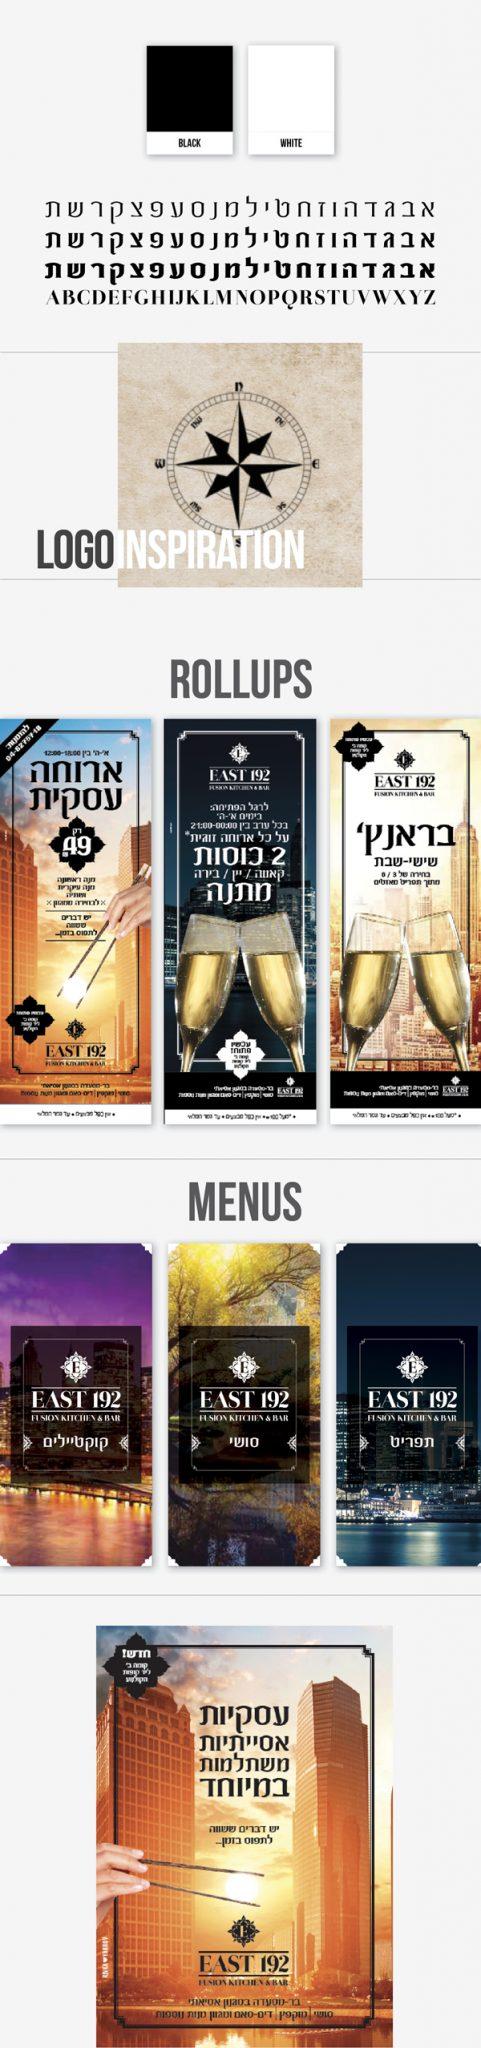 asian, restaurant, branding, exclusive, logo, menu, sign, rollups